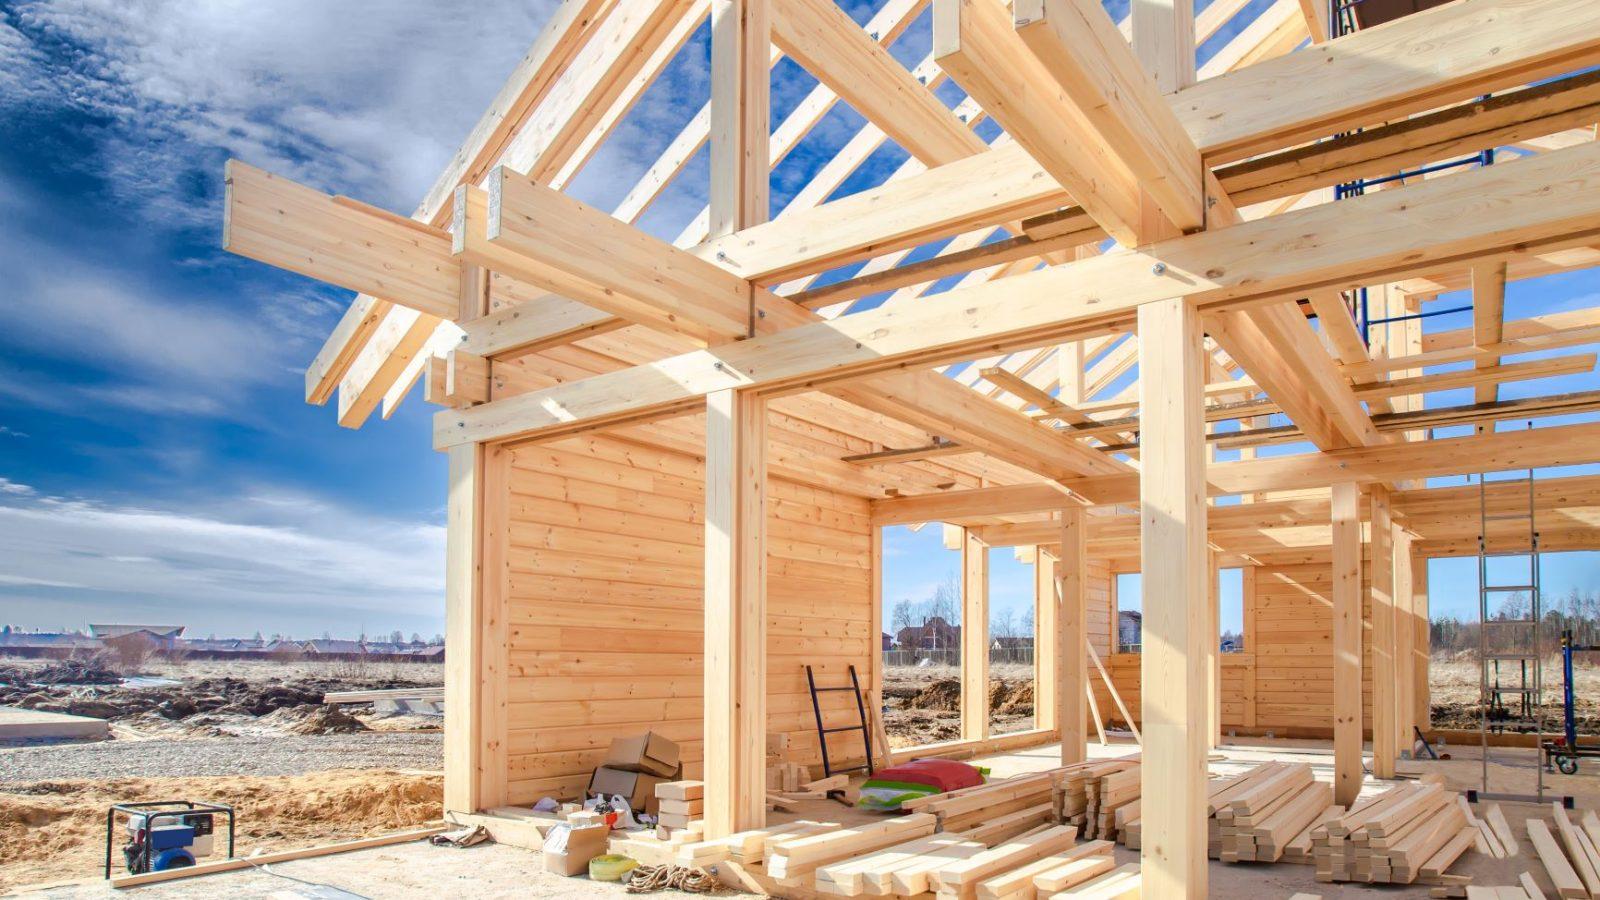 CF Breeze Construction - Commercial Construction Experts